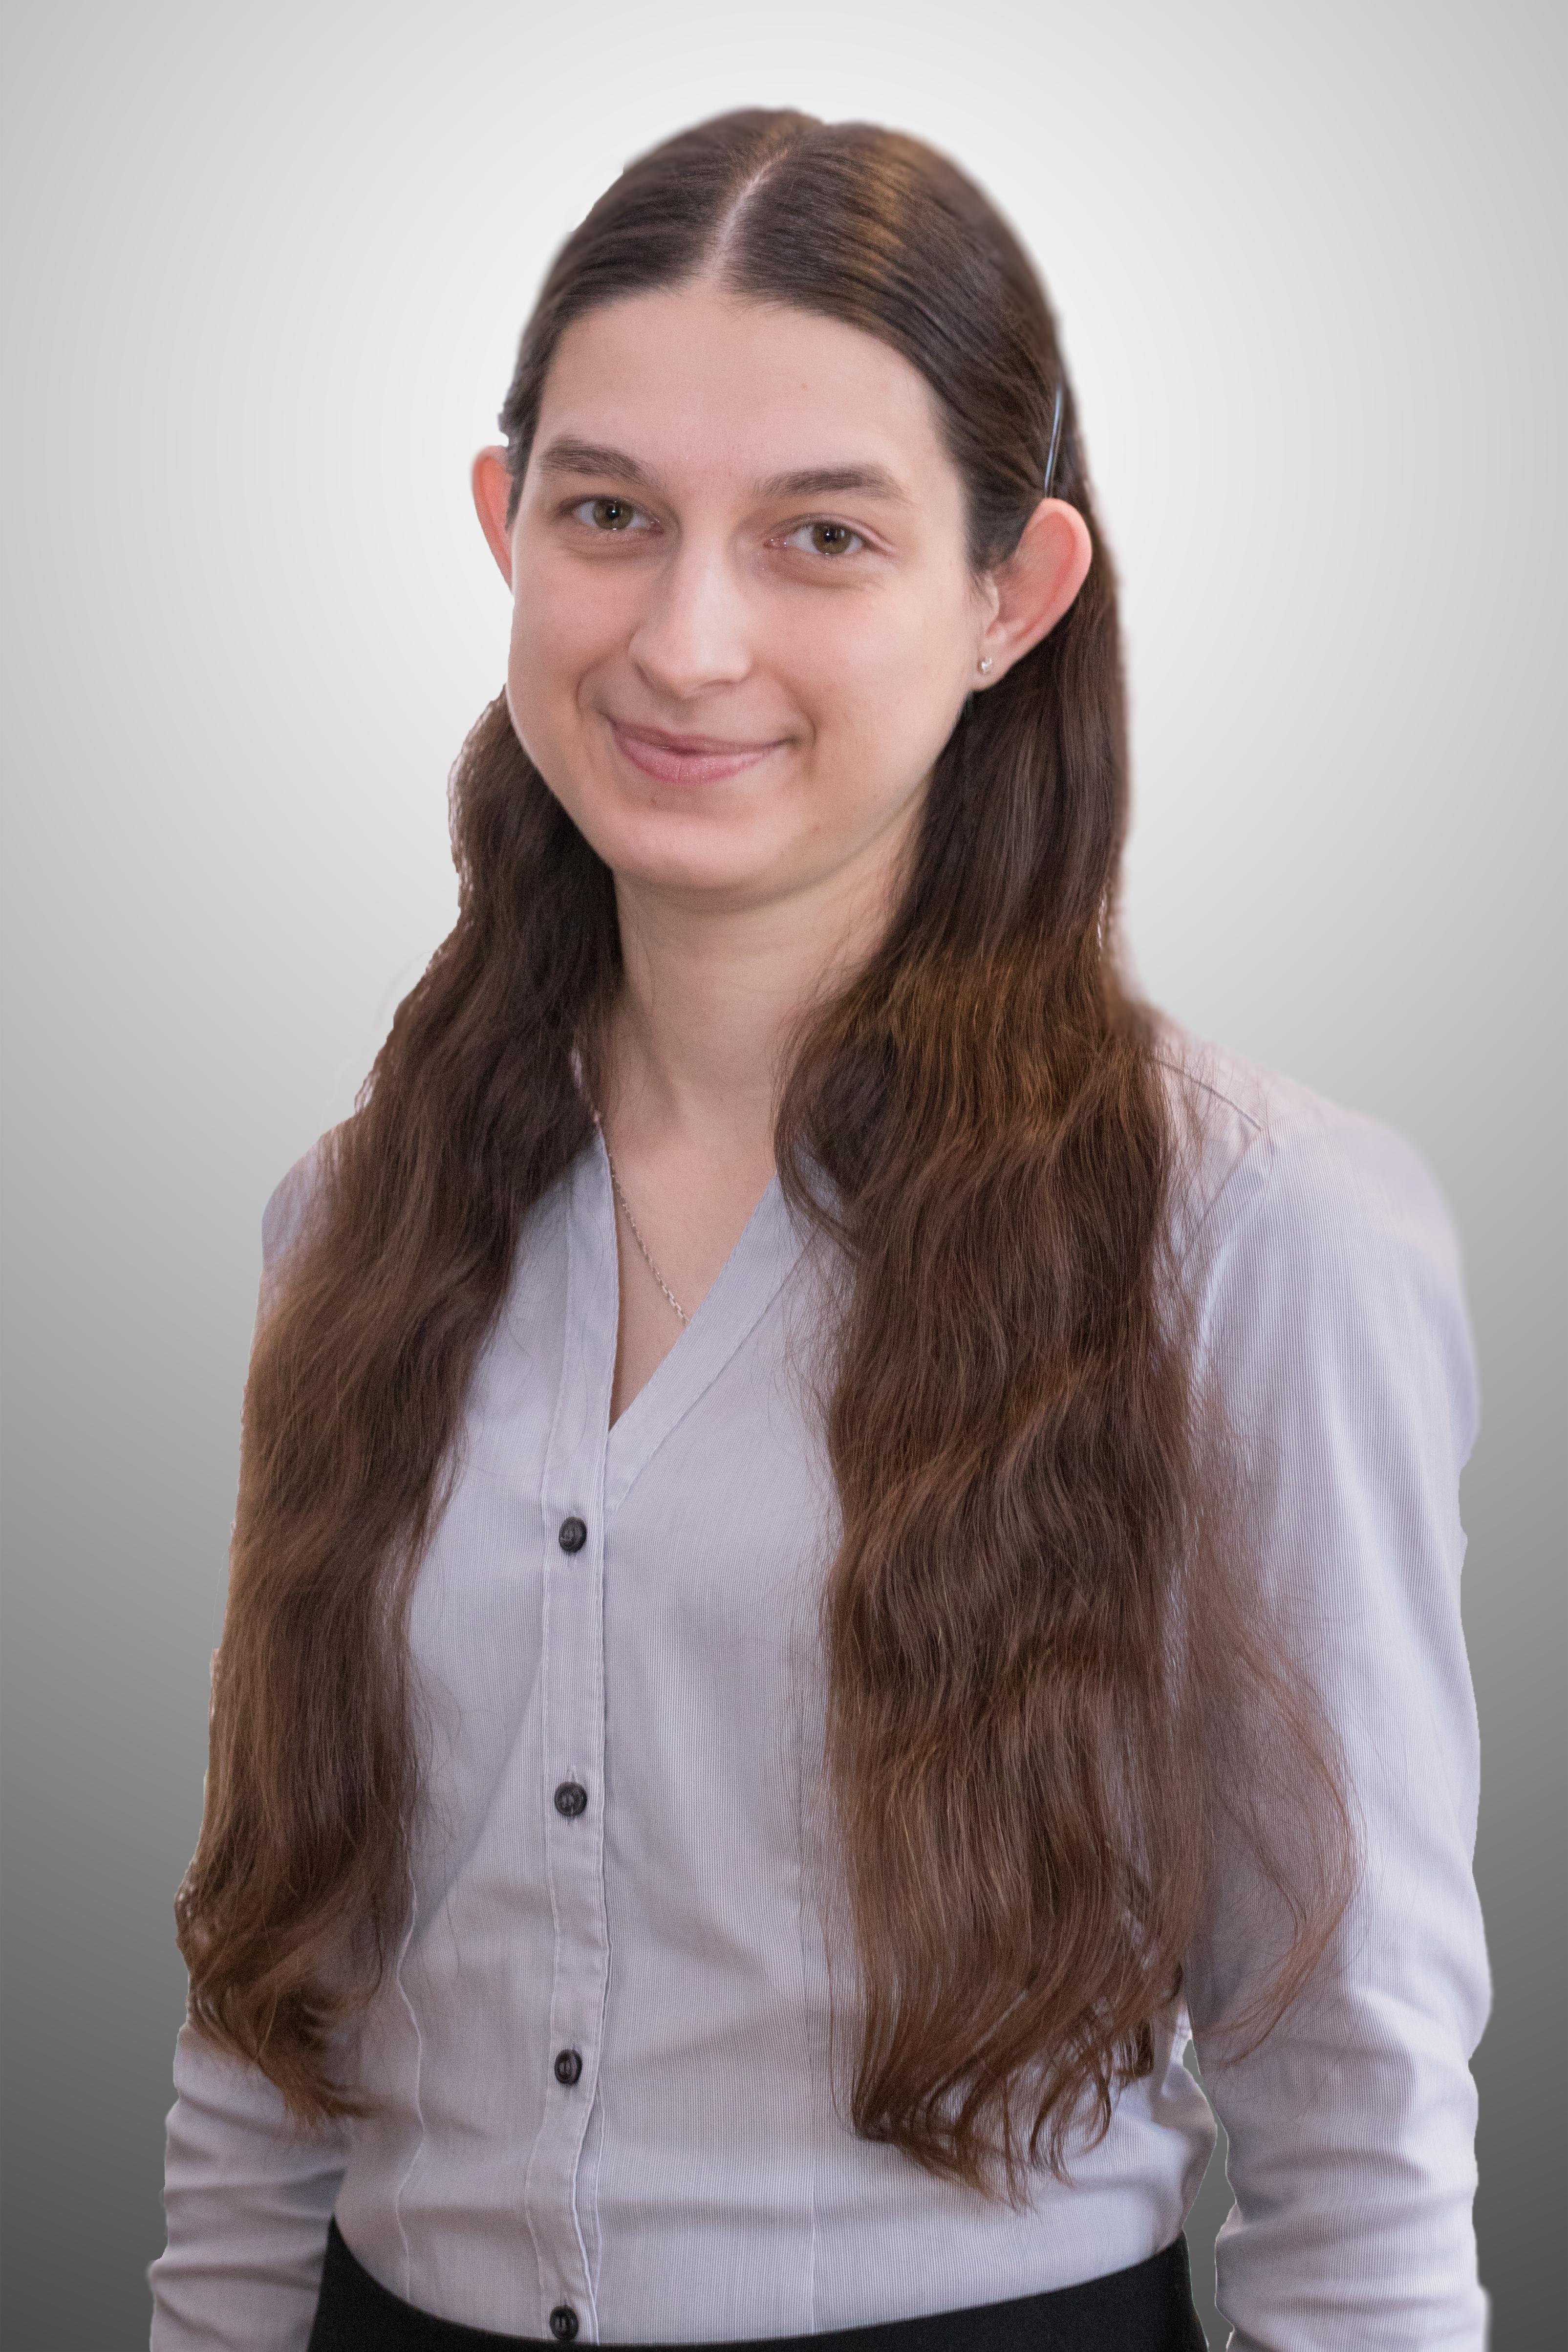 Malgorzata Karpinska